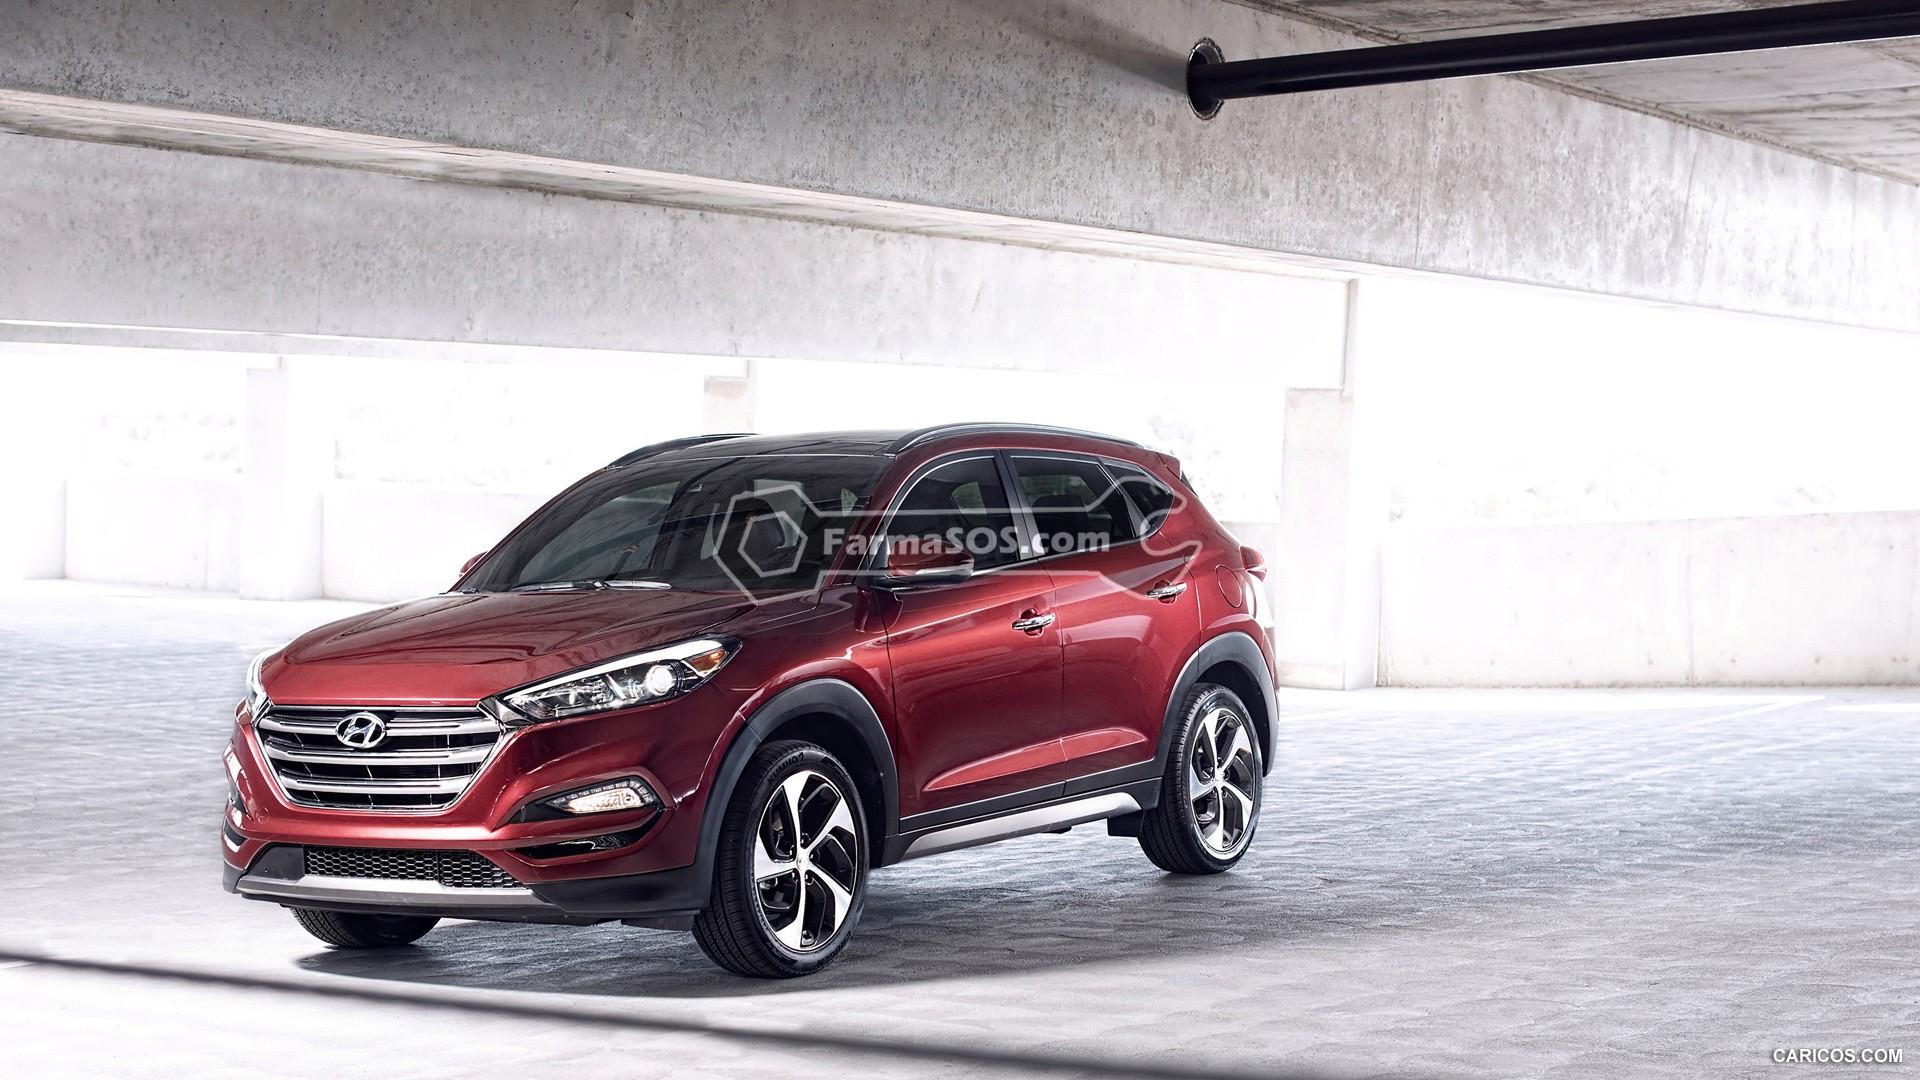 Hyundai Tucson 2015 2017 1 تصاویر هیوندای توسان مدل 2016 تا 2018